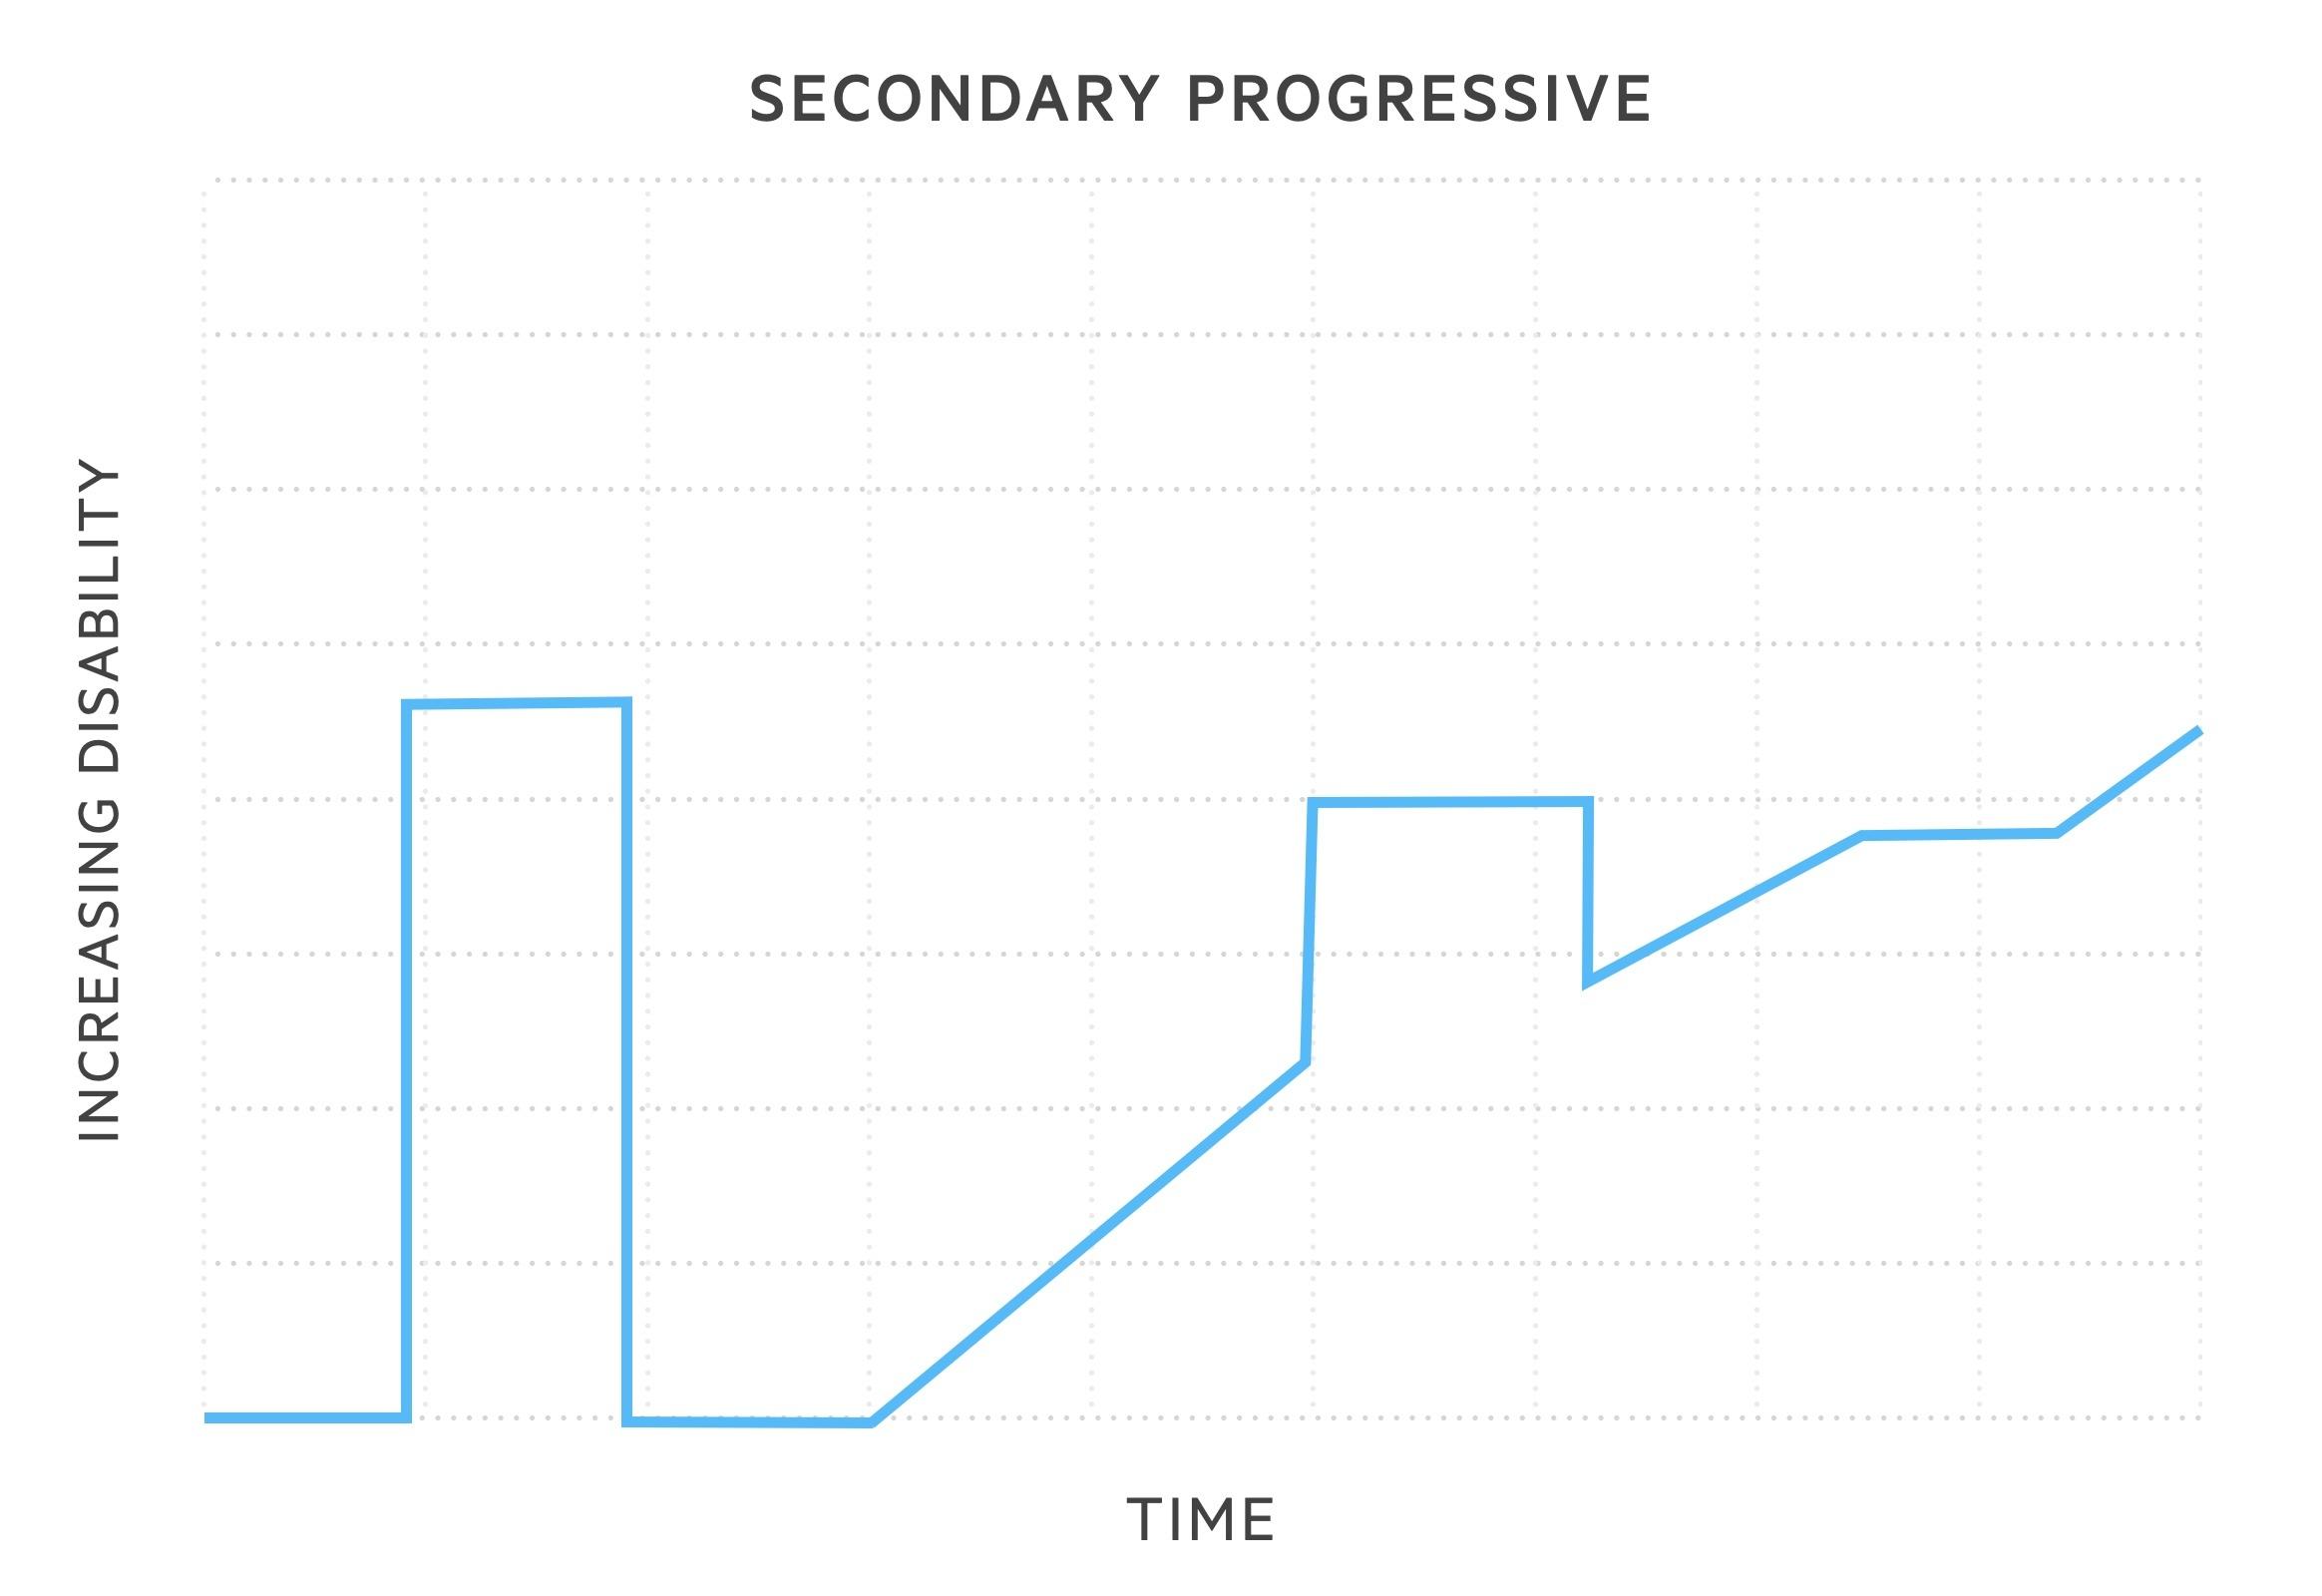 Secondary progressive MS